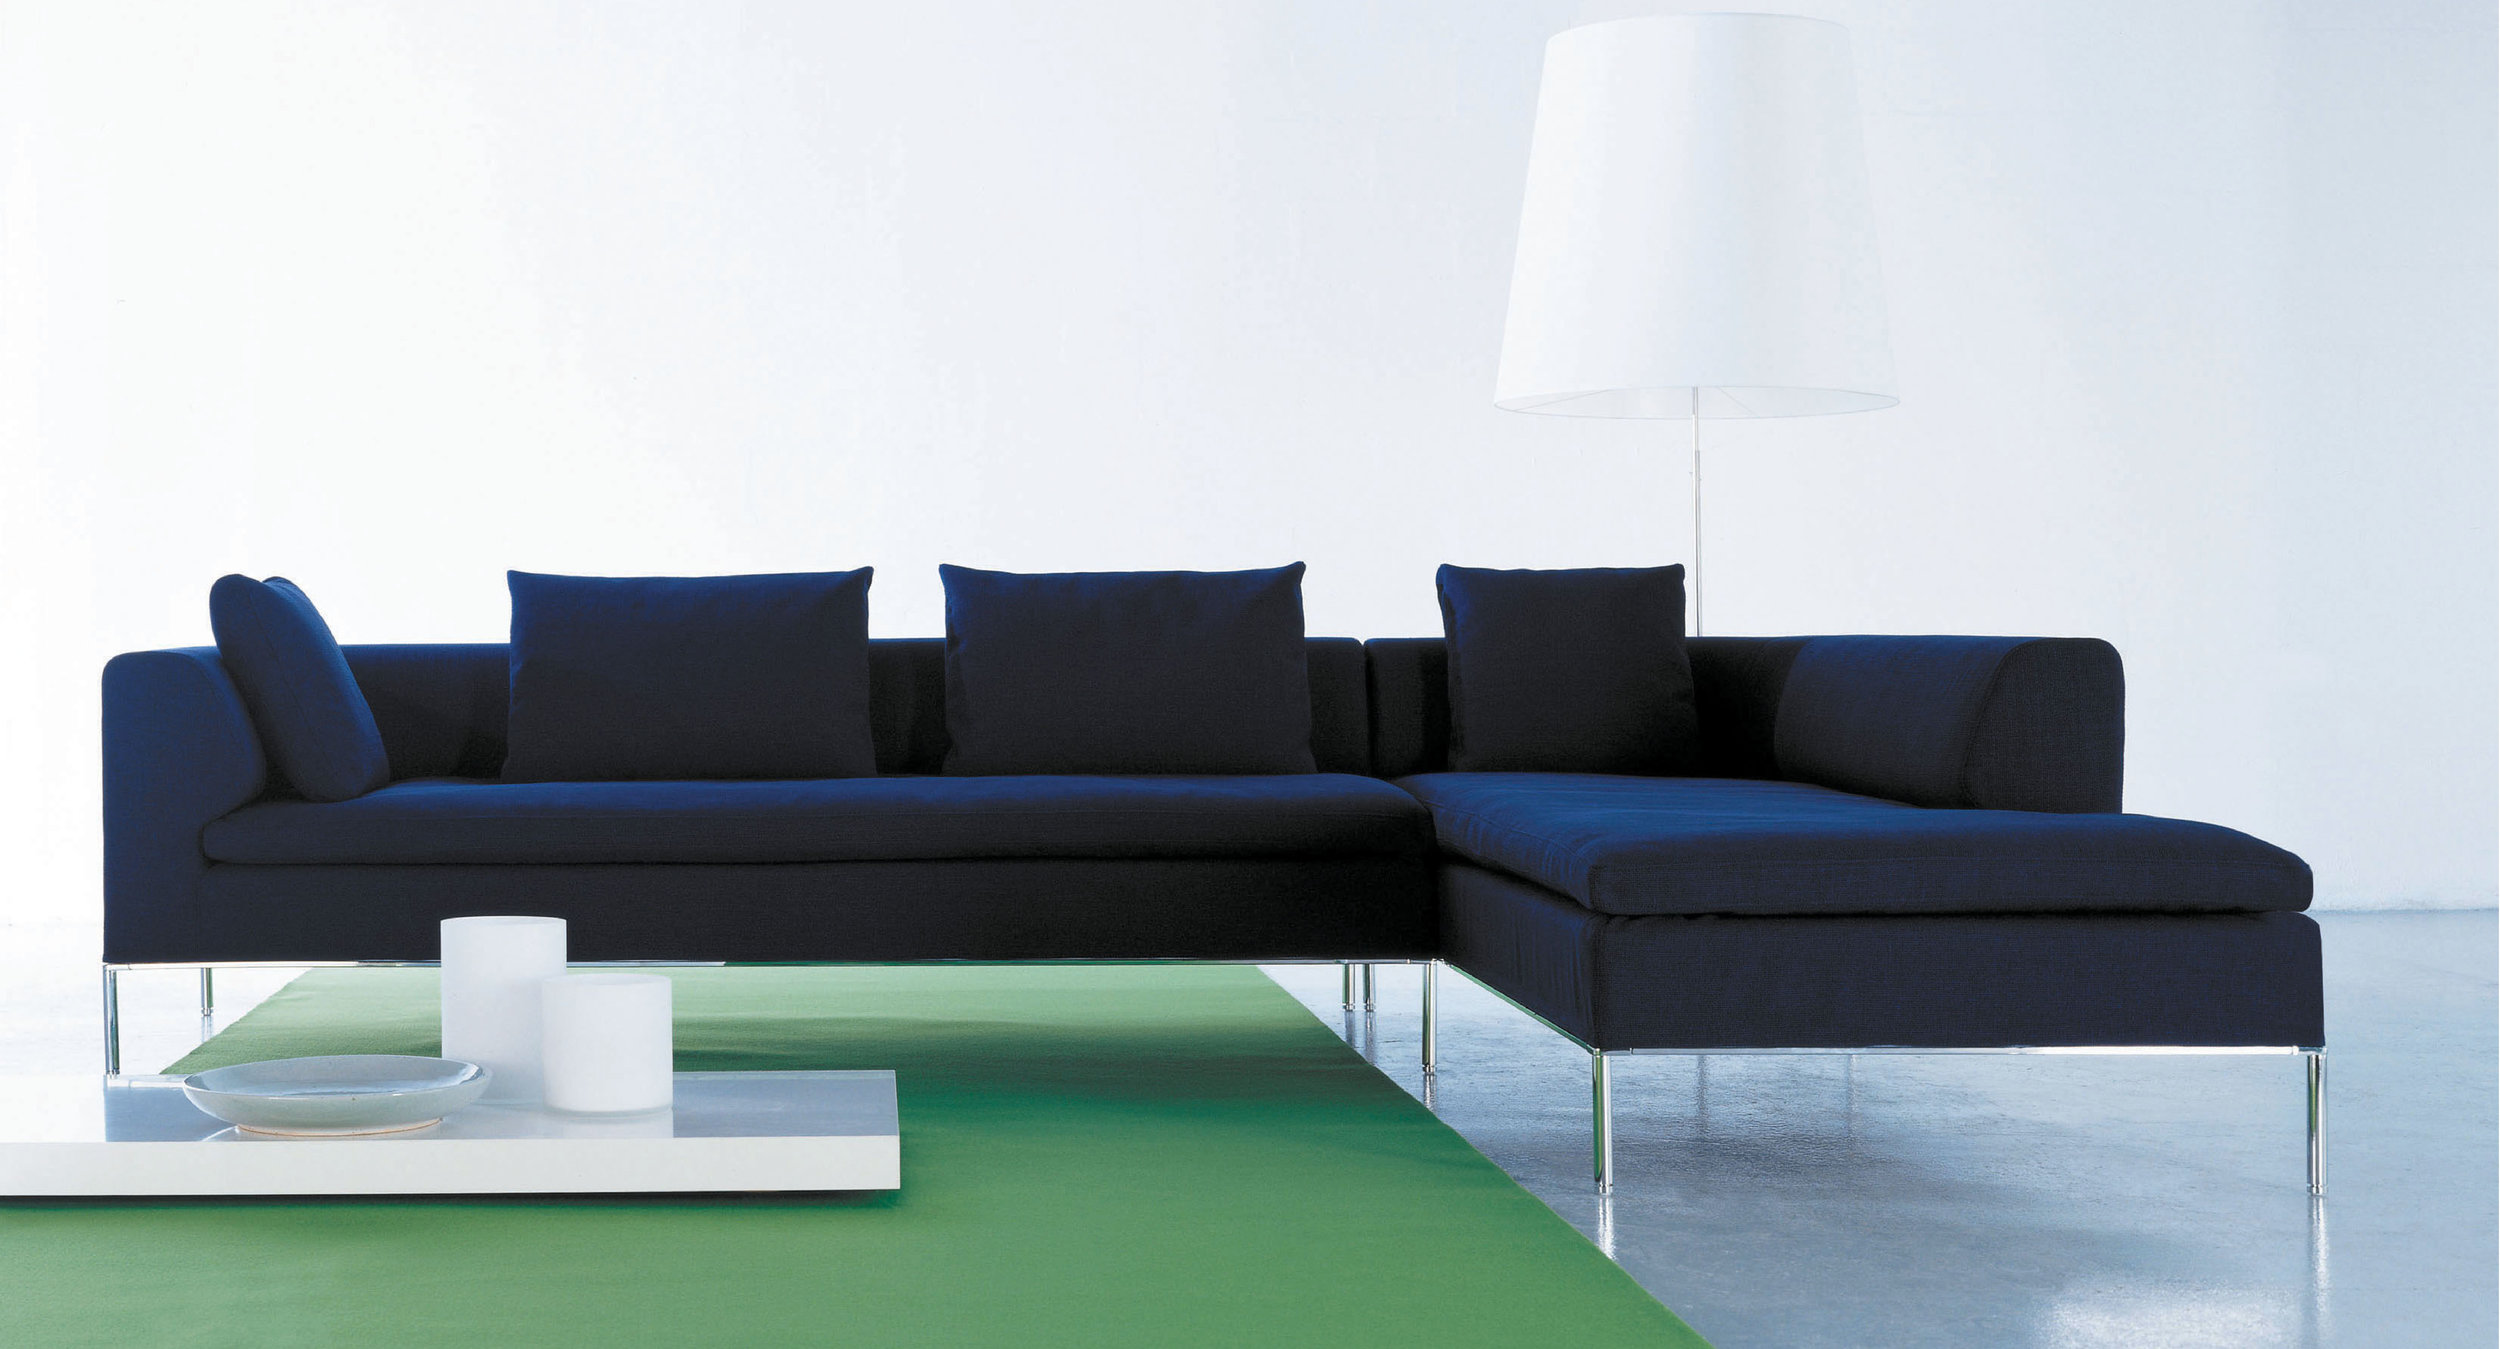 Argentum Sofa collection